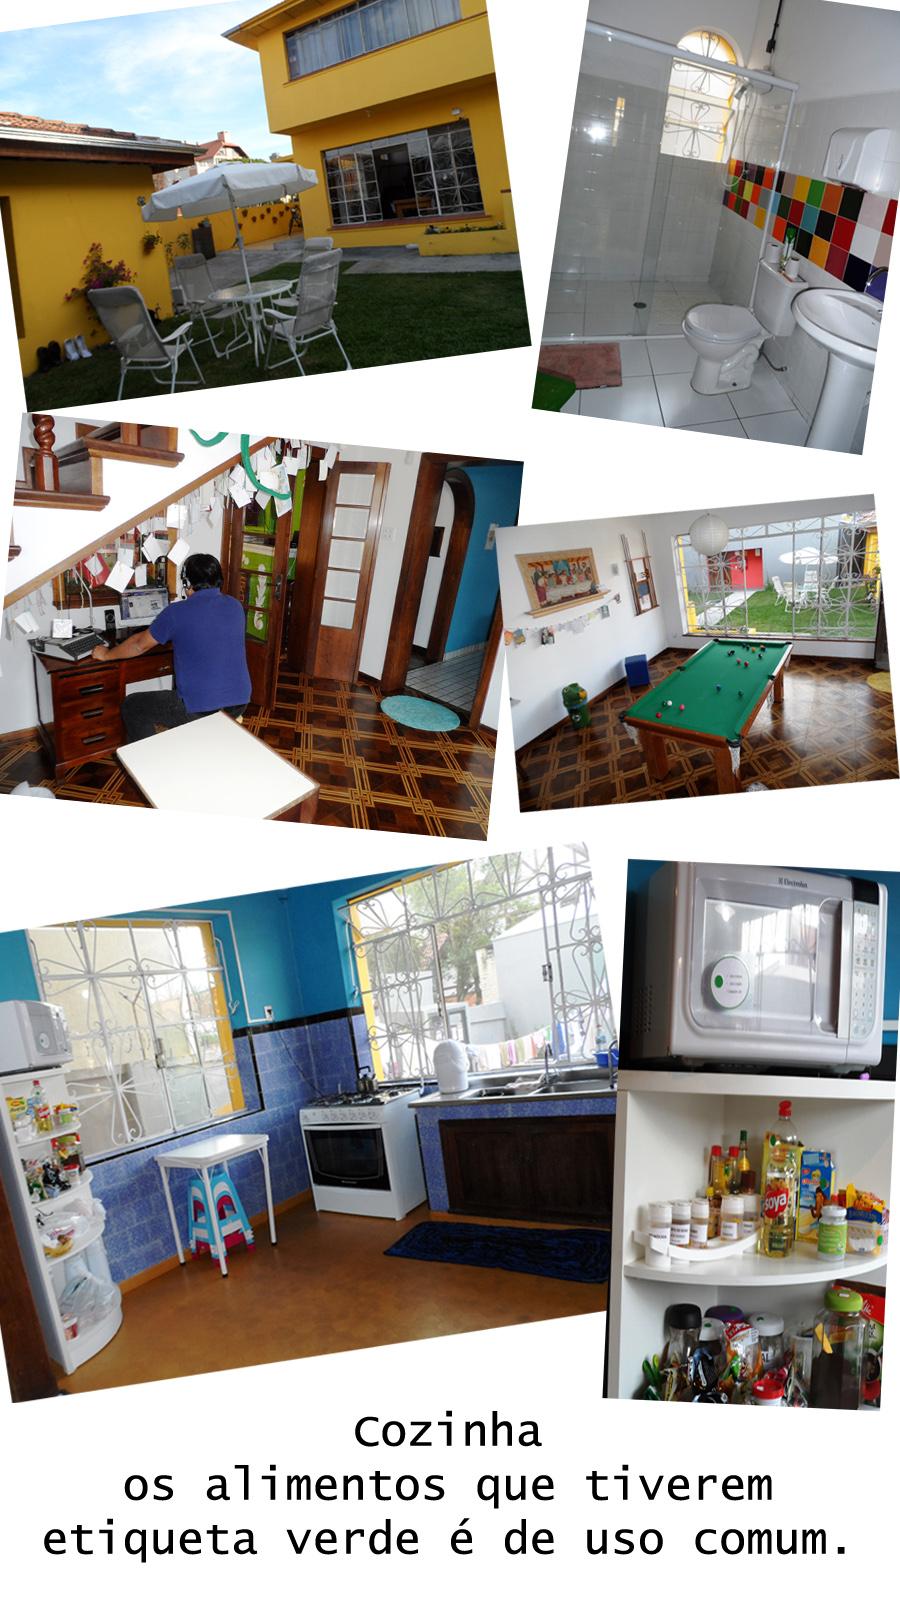 hostel em curitiba, curitiba  hostel, Knock Knock Hostel, Motter Home, Eco Hostel